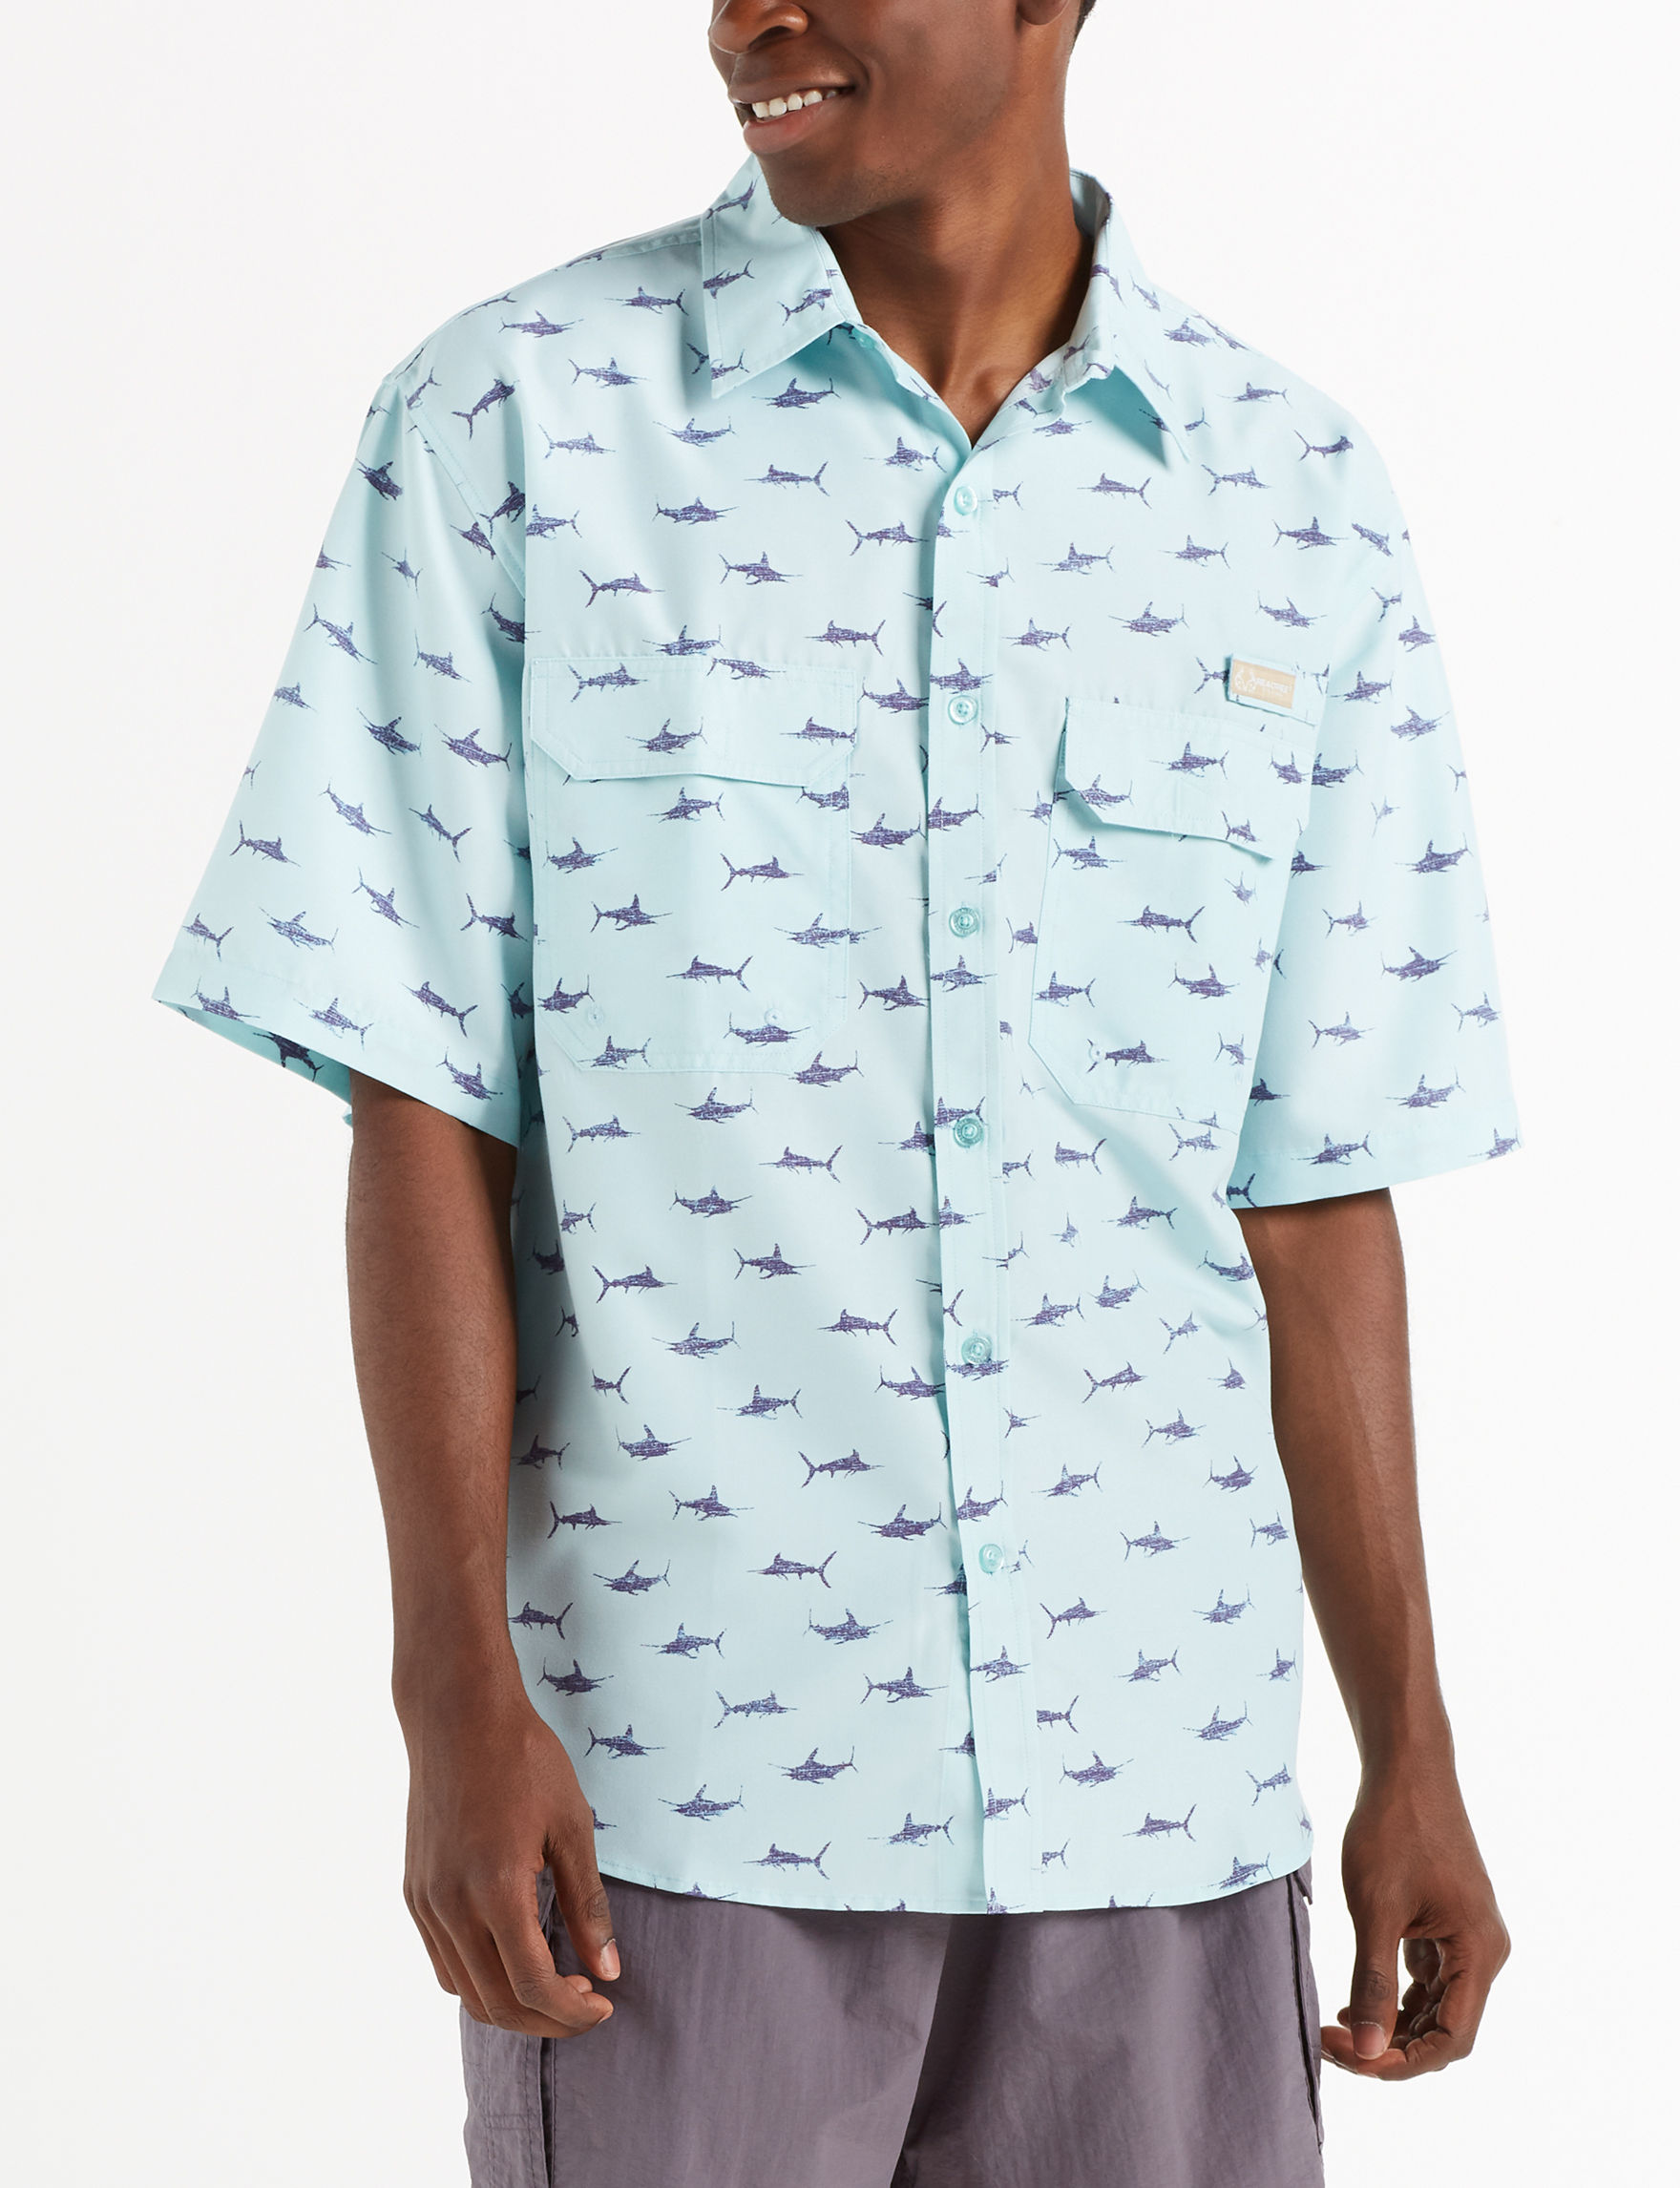 Realtree Aqua Casual Button Down Shirts